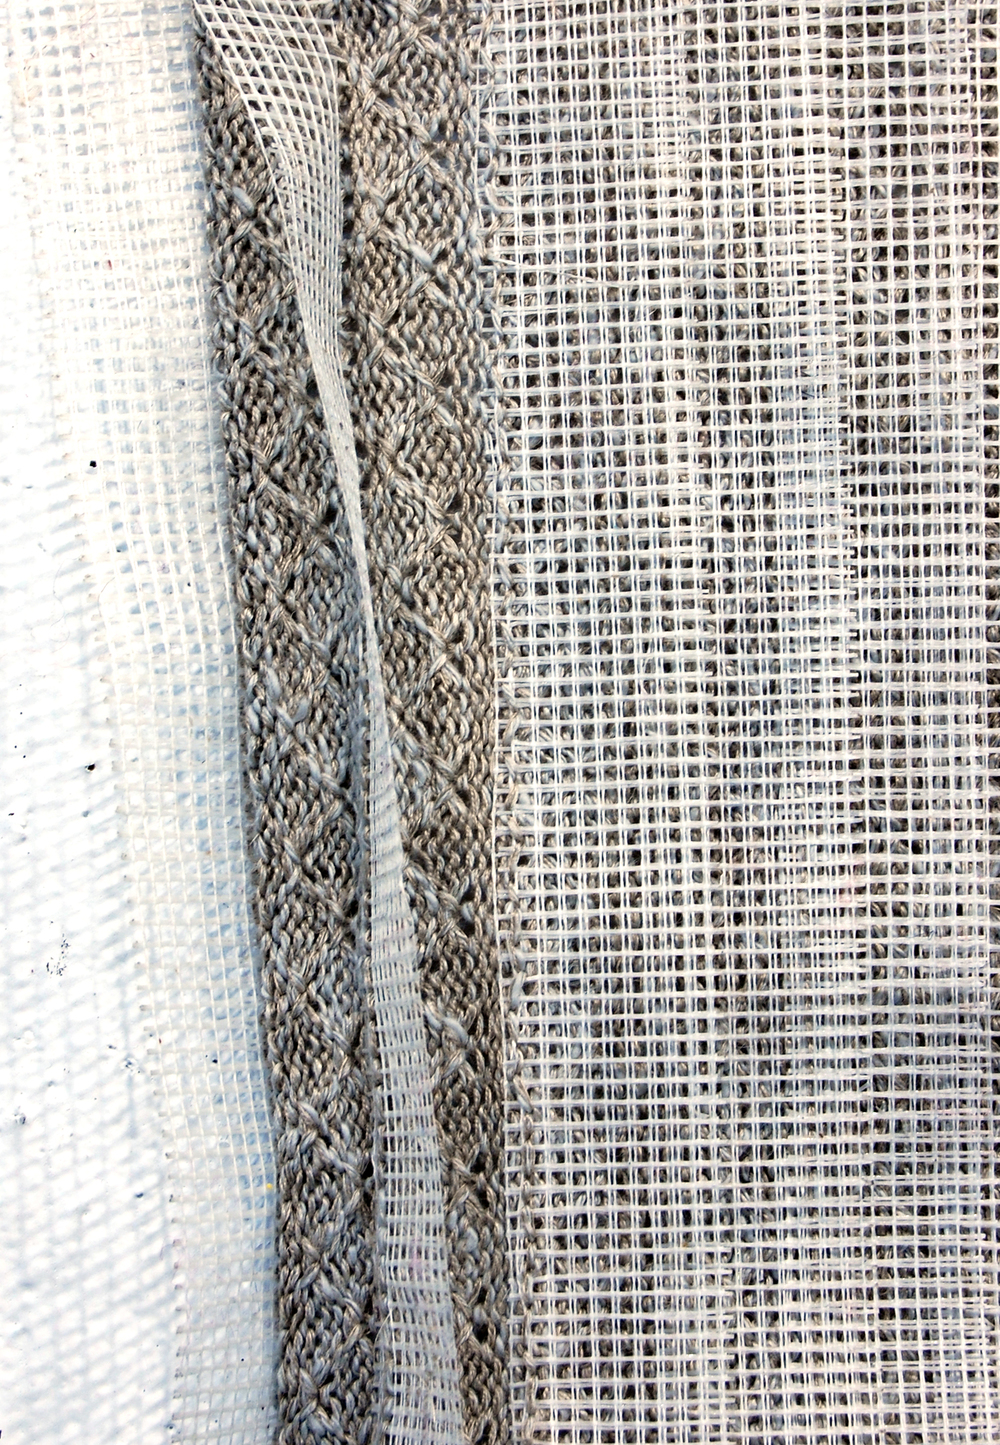 knitwoven mesh.jpg